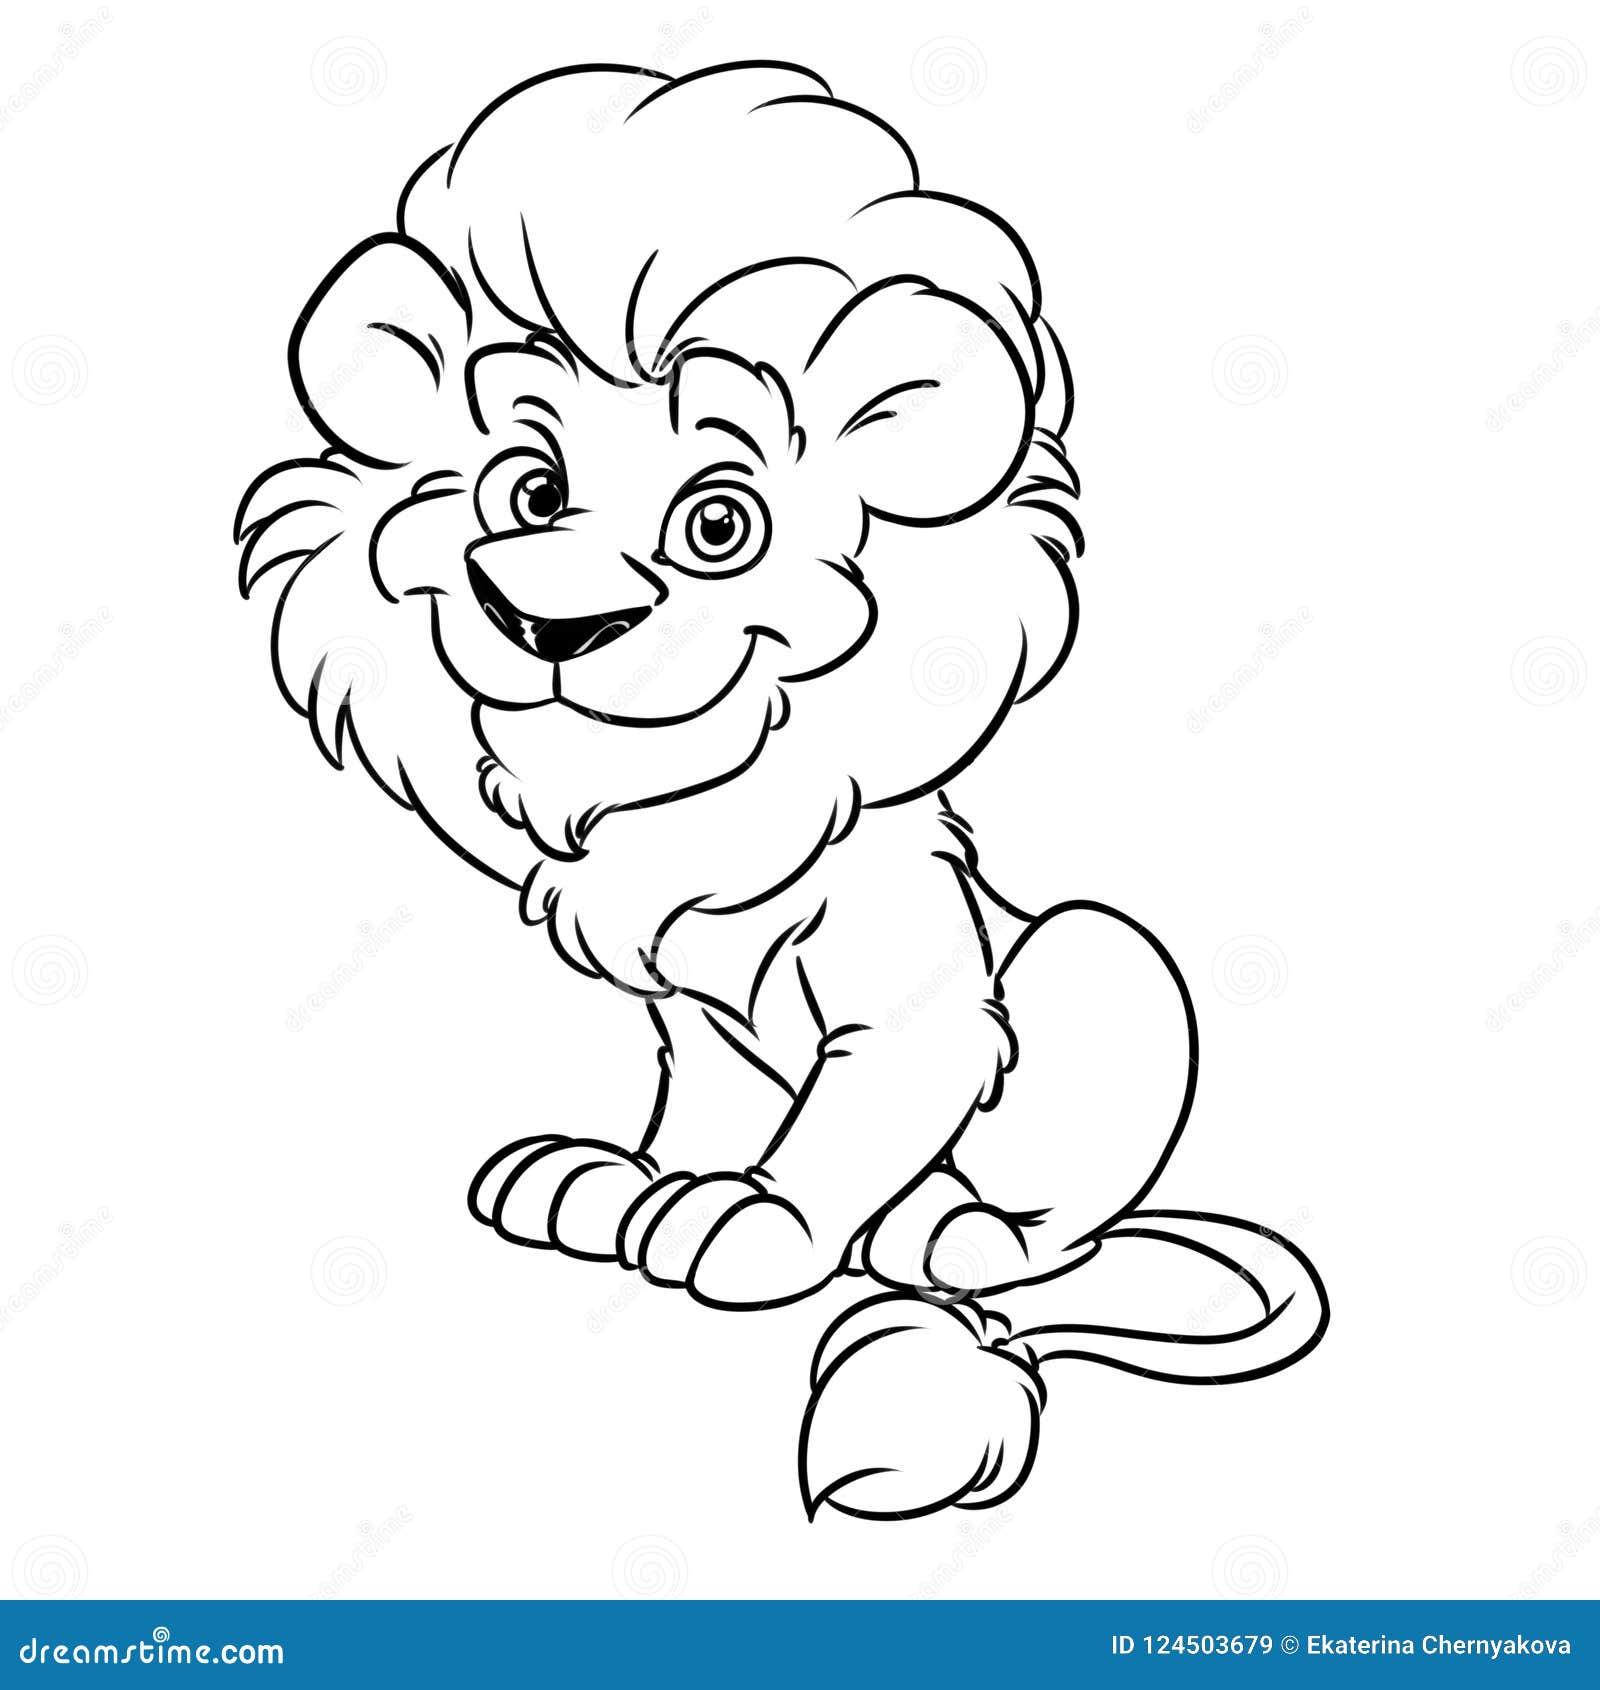 Lion Good Animal Contour Coloring Page Cartoon Stock Illustration